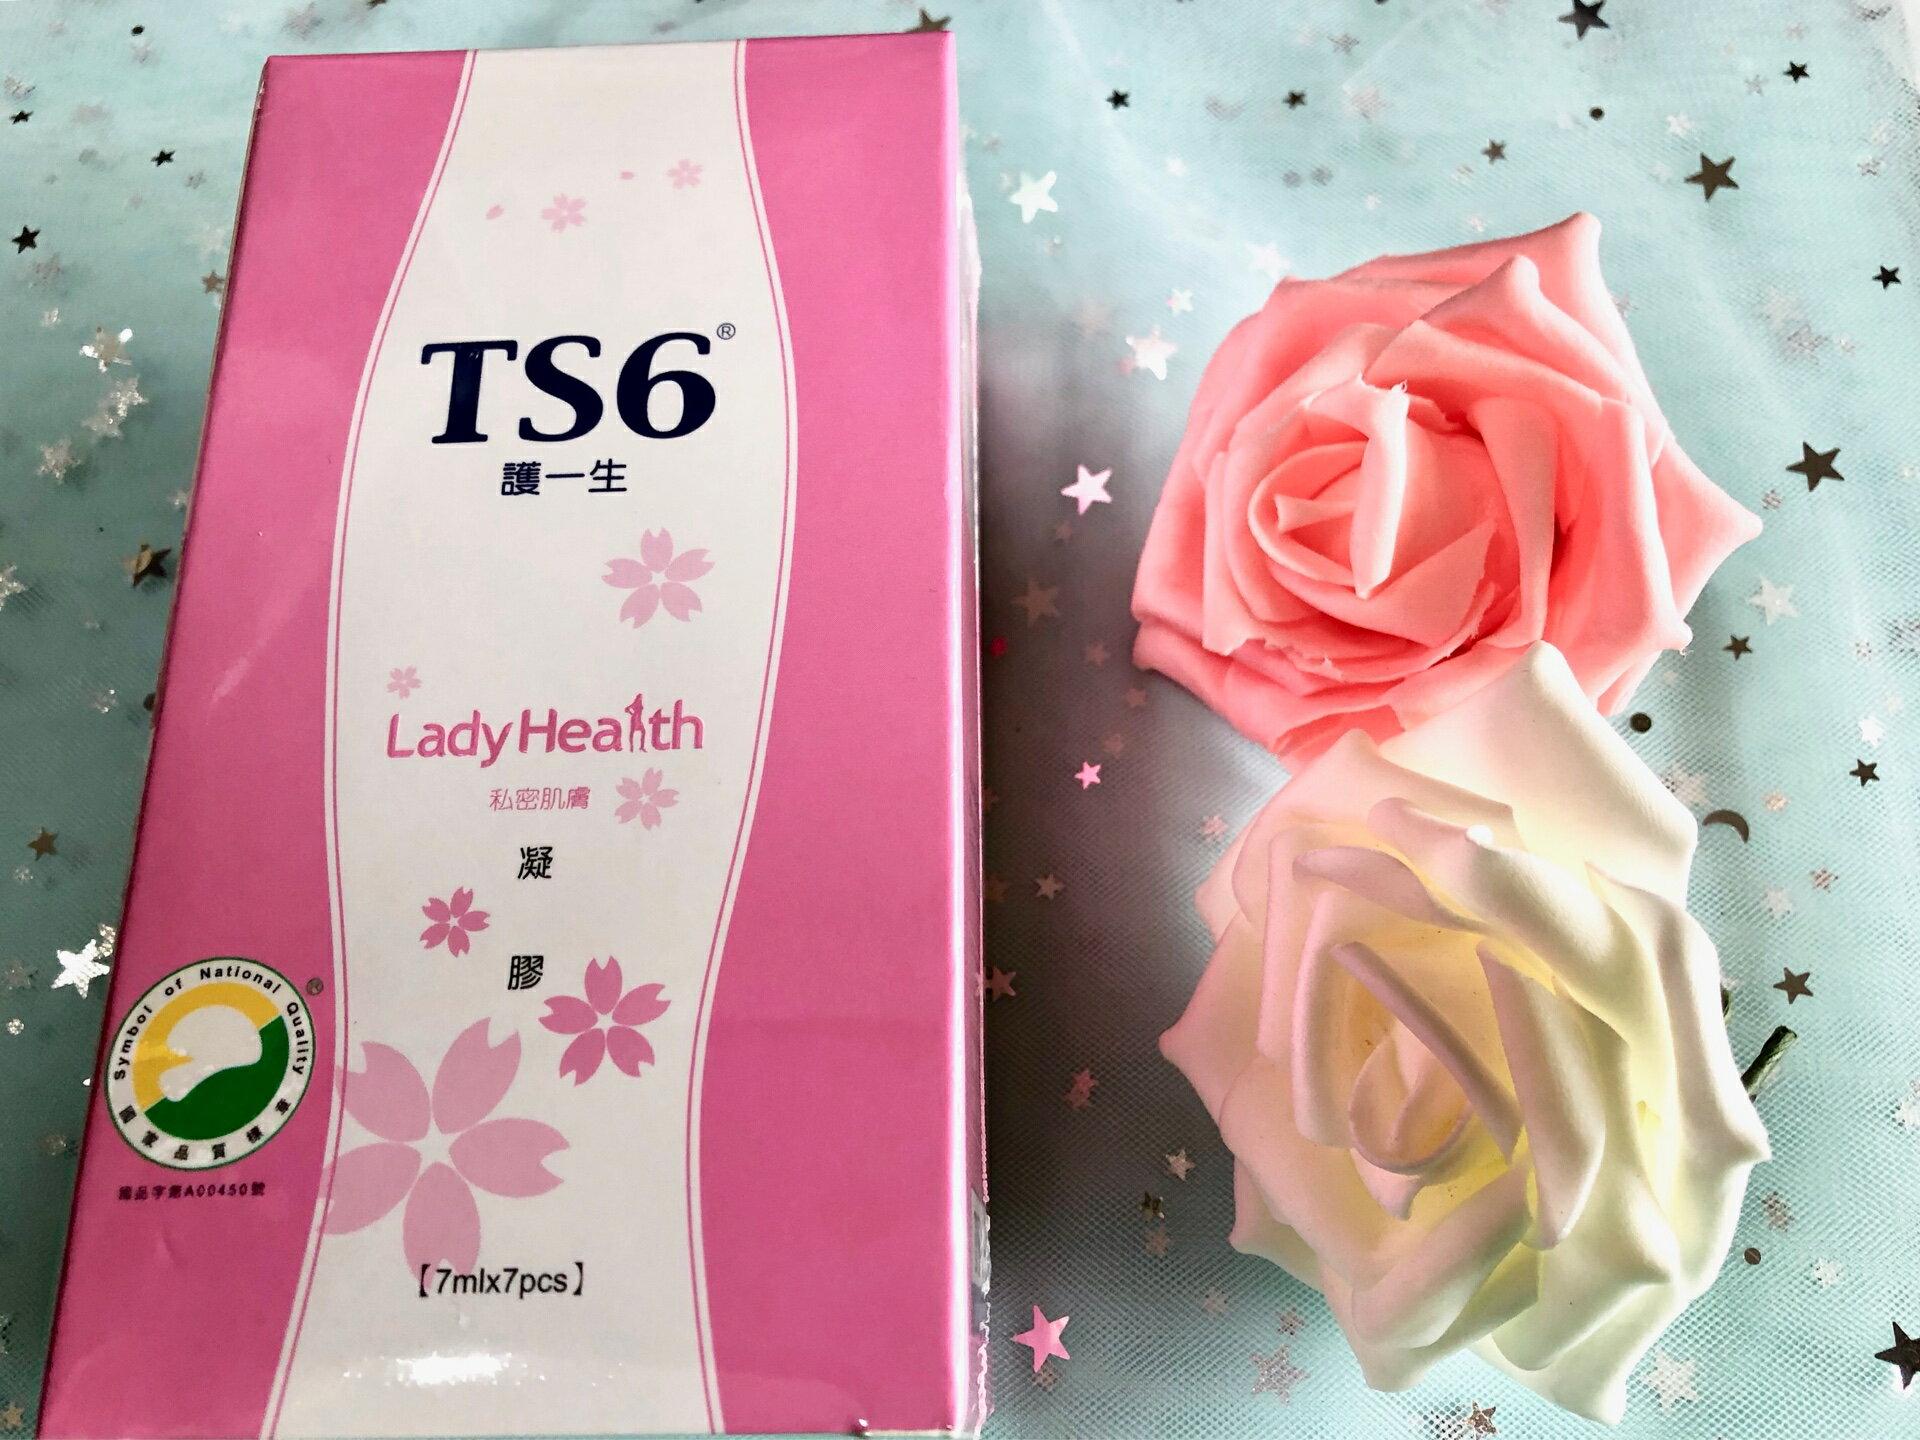 TS6 護一生凝膠7支 盒裝陶晶瑩代言/效期2022 【淨妍美肌】